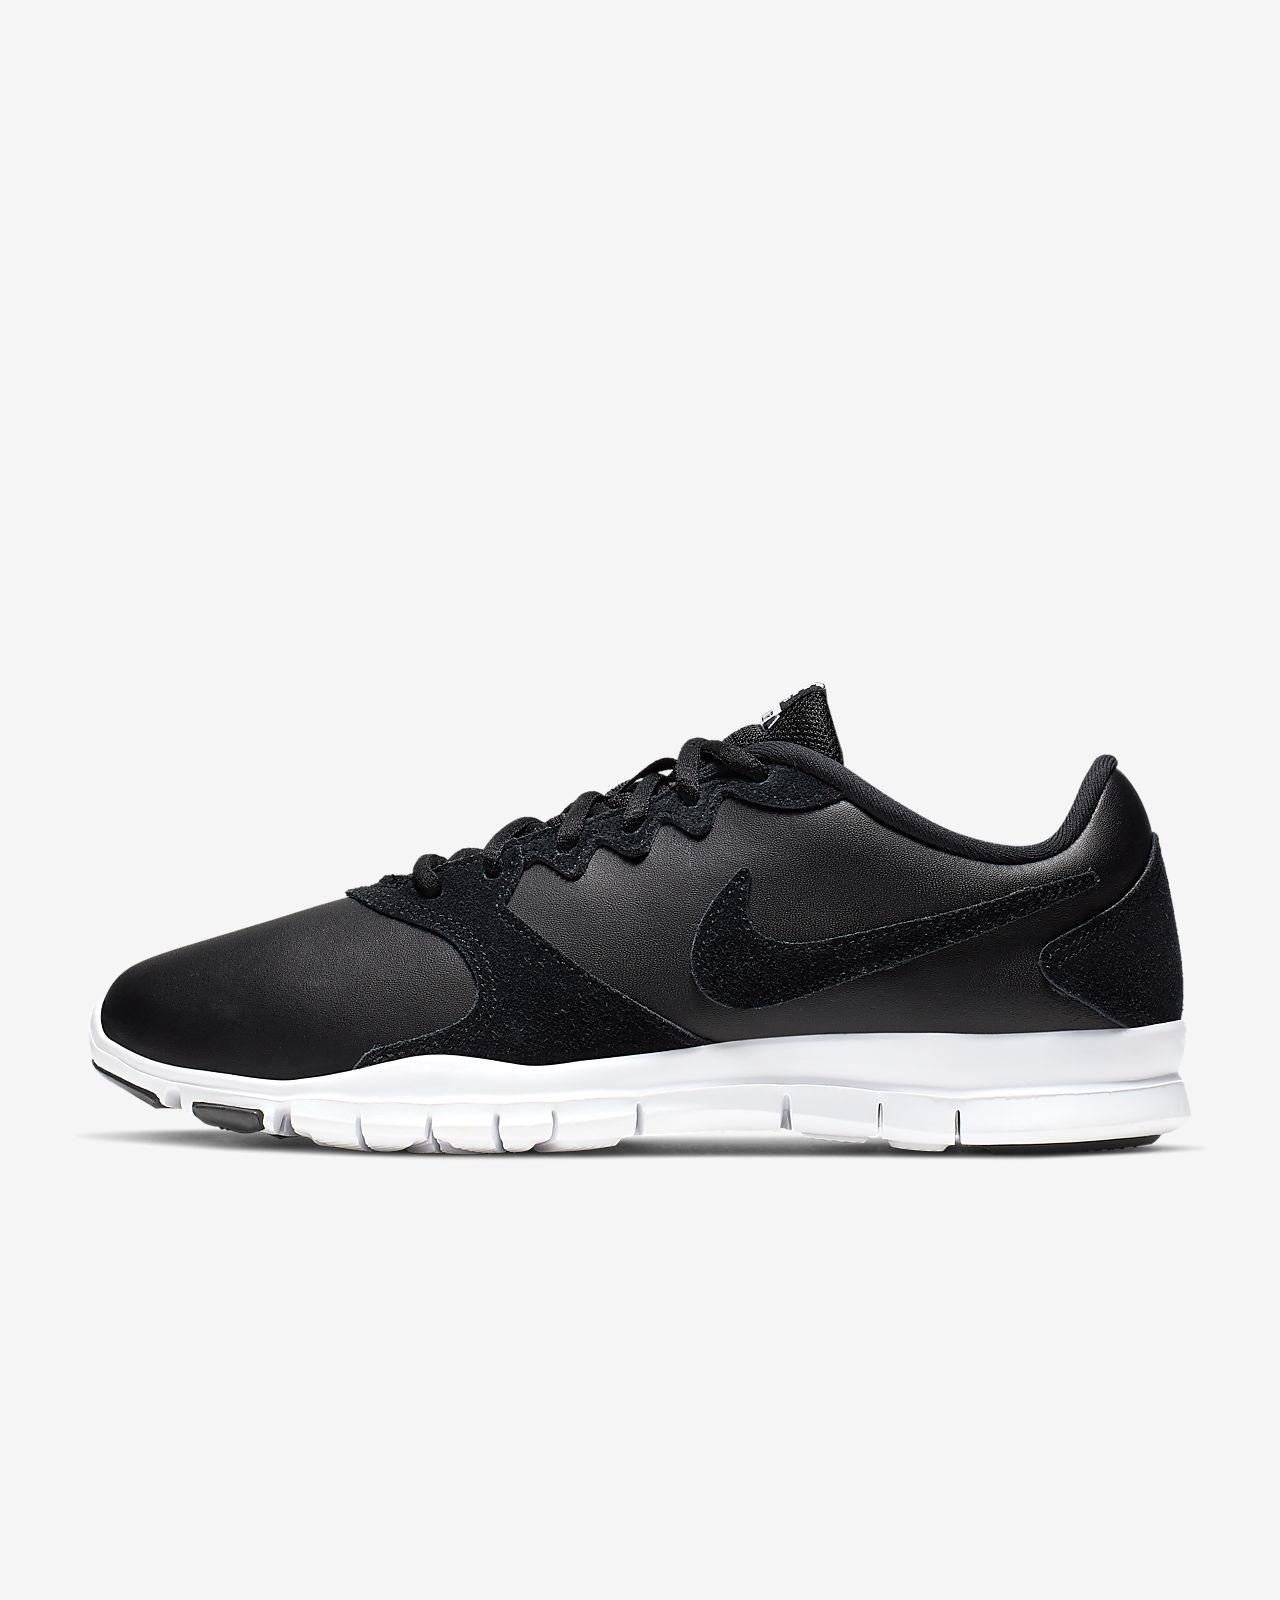 Calzado de entrenamiento para mujer Nike Flex Essential TR Leather